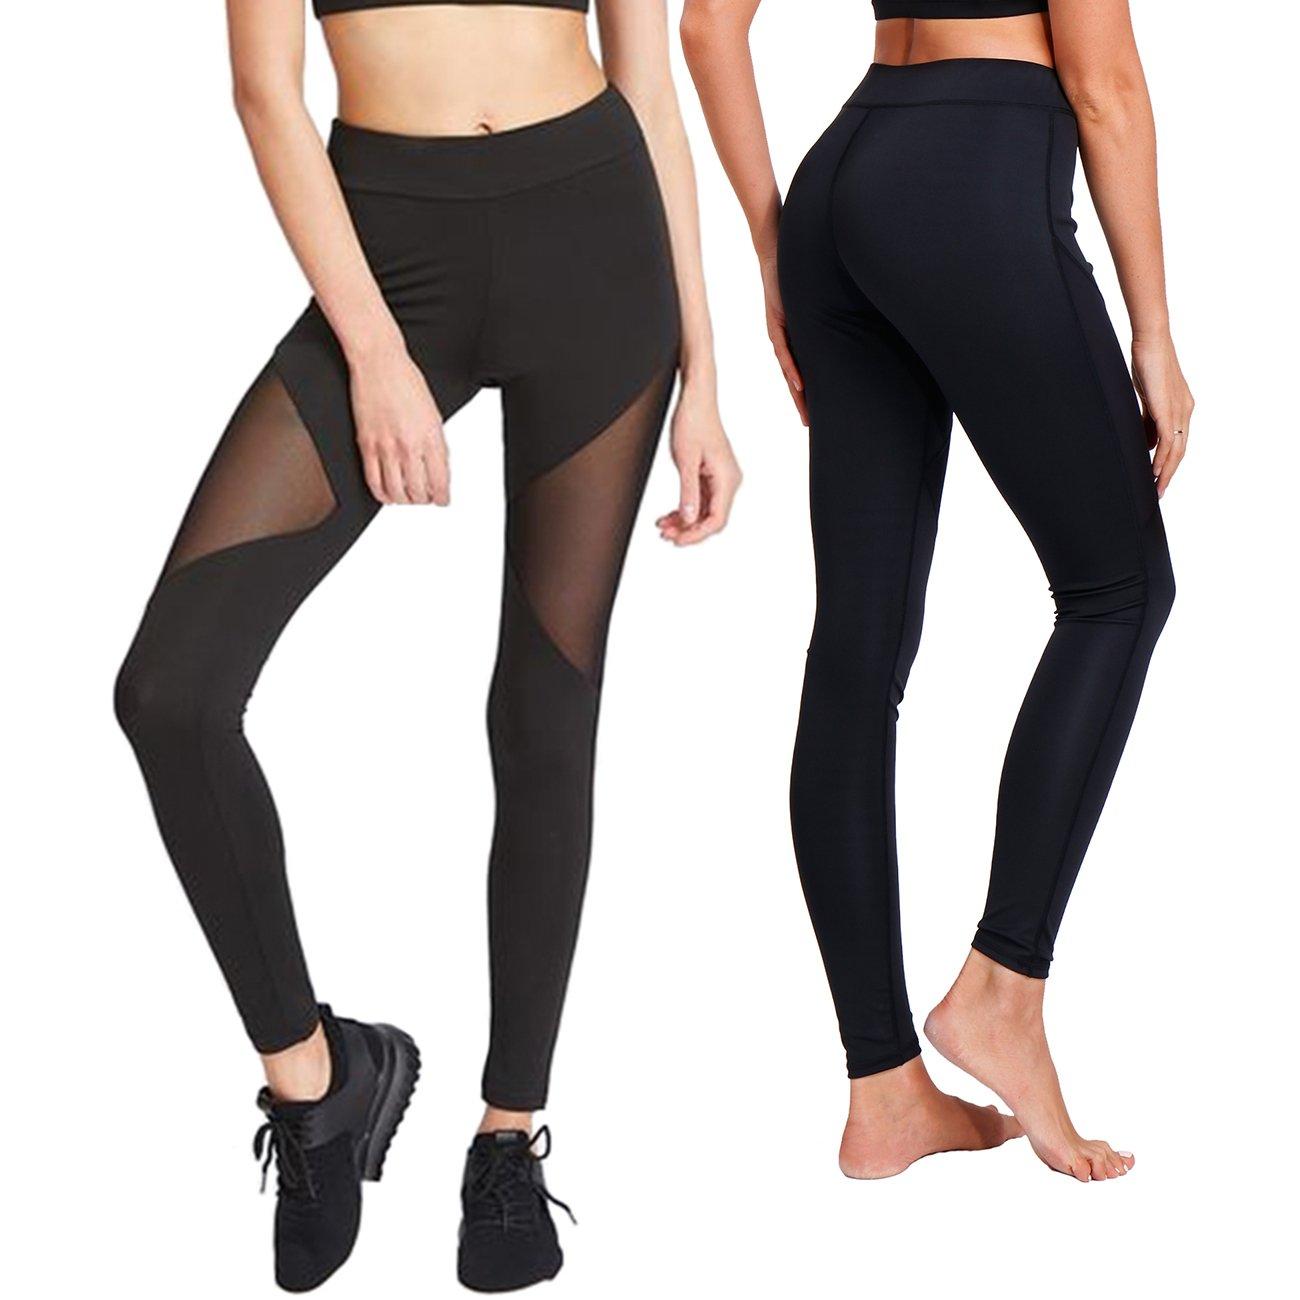 KIWI RATA Women Sports Mesh Trouser Gym Workout Fitness Capris Yoga Pant Legging (S, Black-Thigh Mesh)